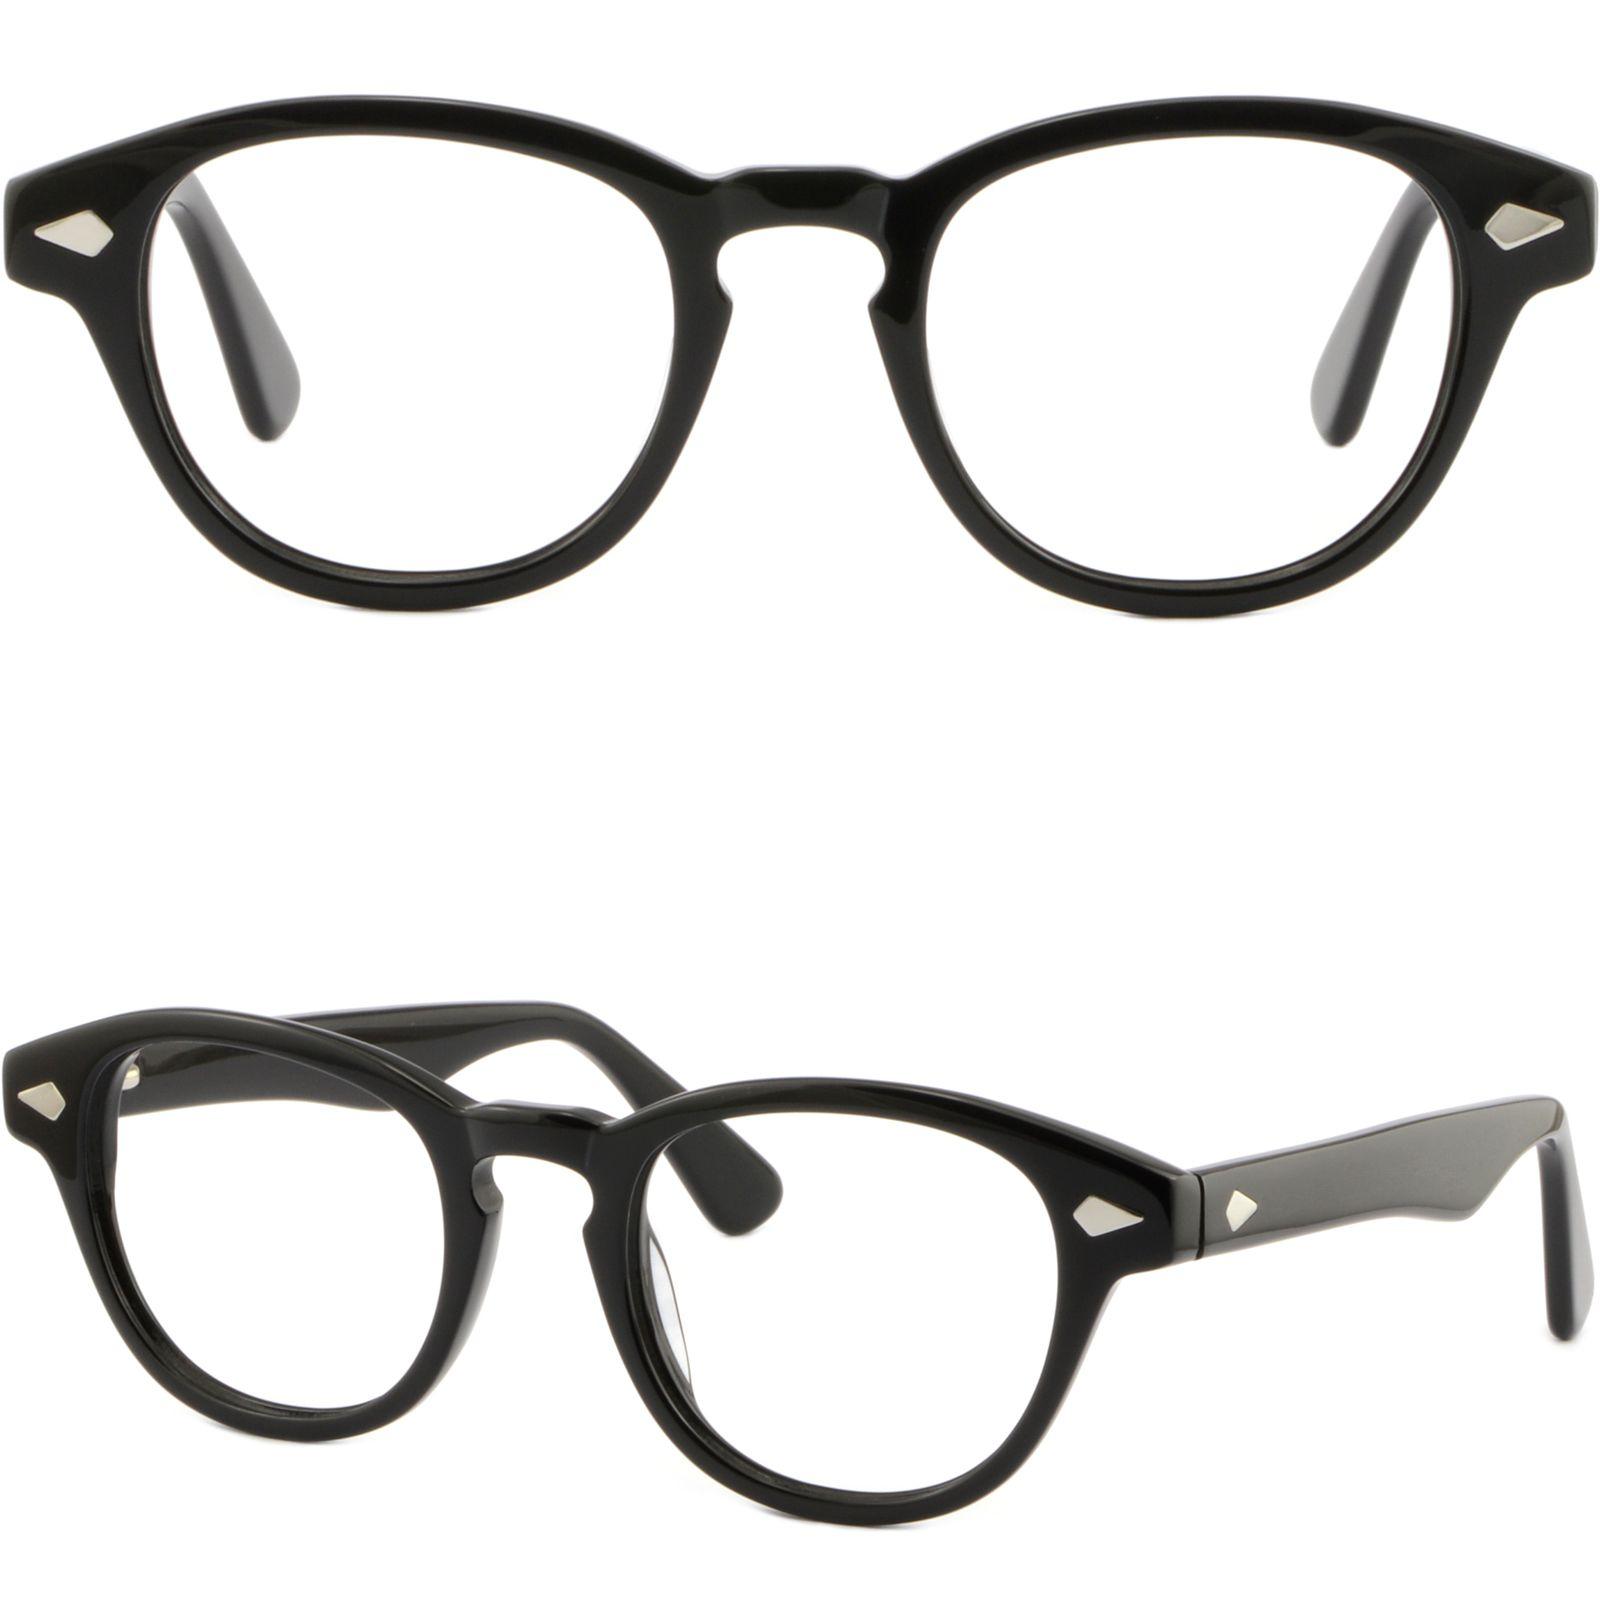 02ccec3e54c3 Men s Women s Thick Plastic Frame Prescription Glasses Shiny Black ...